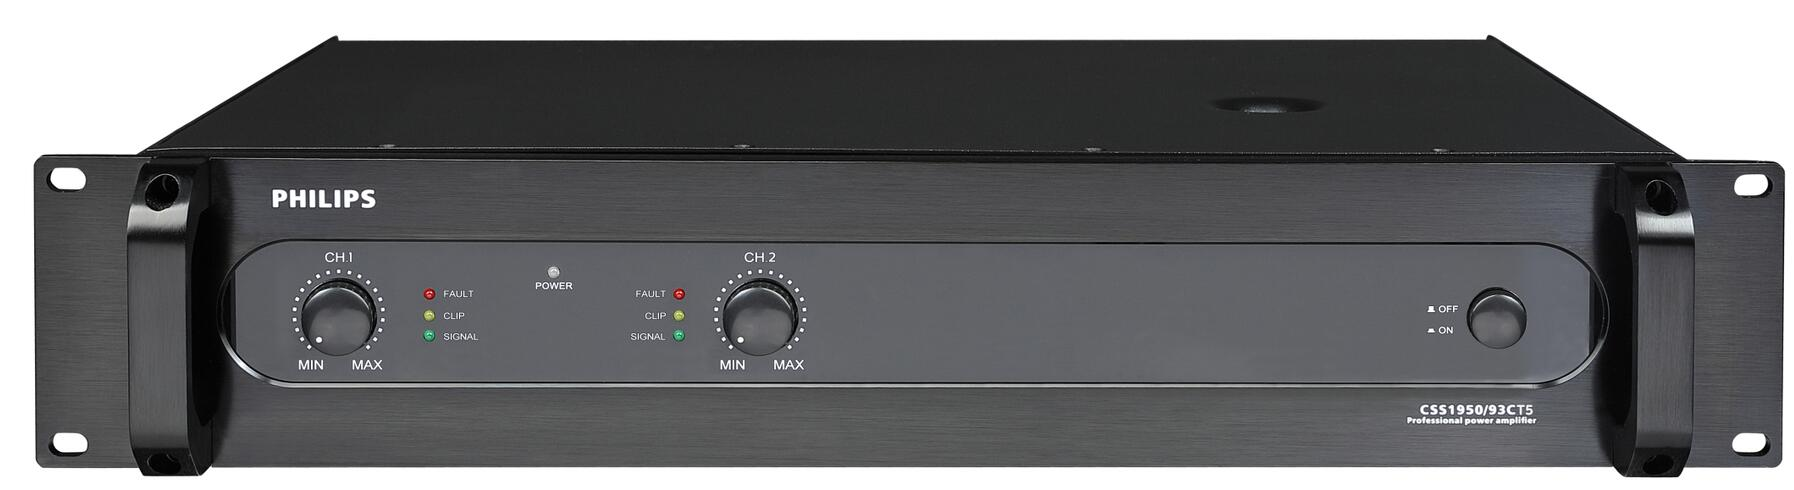 CSS1950/93CT5专业功放600W